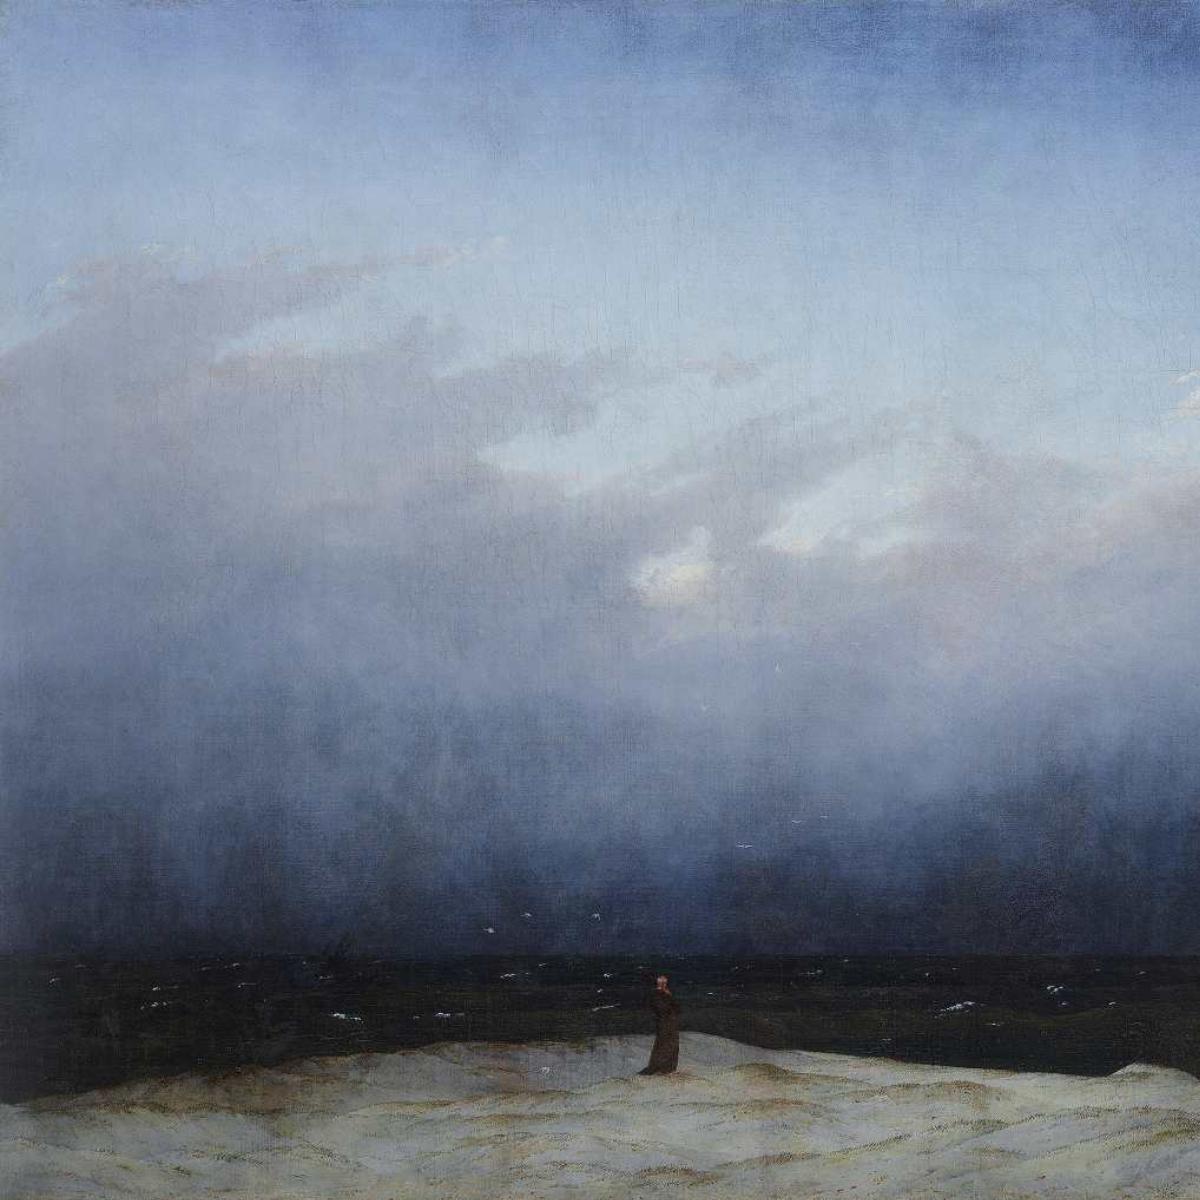 Caspar David Friedrich, The Monk by the Sea, 1808-10